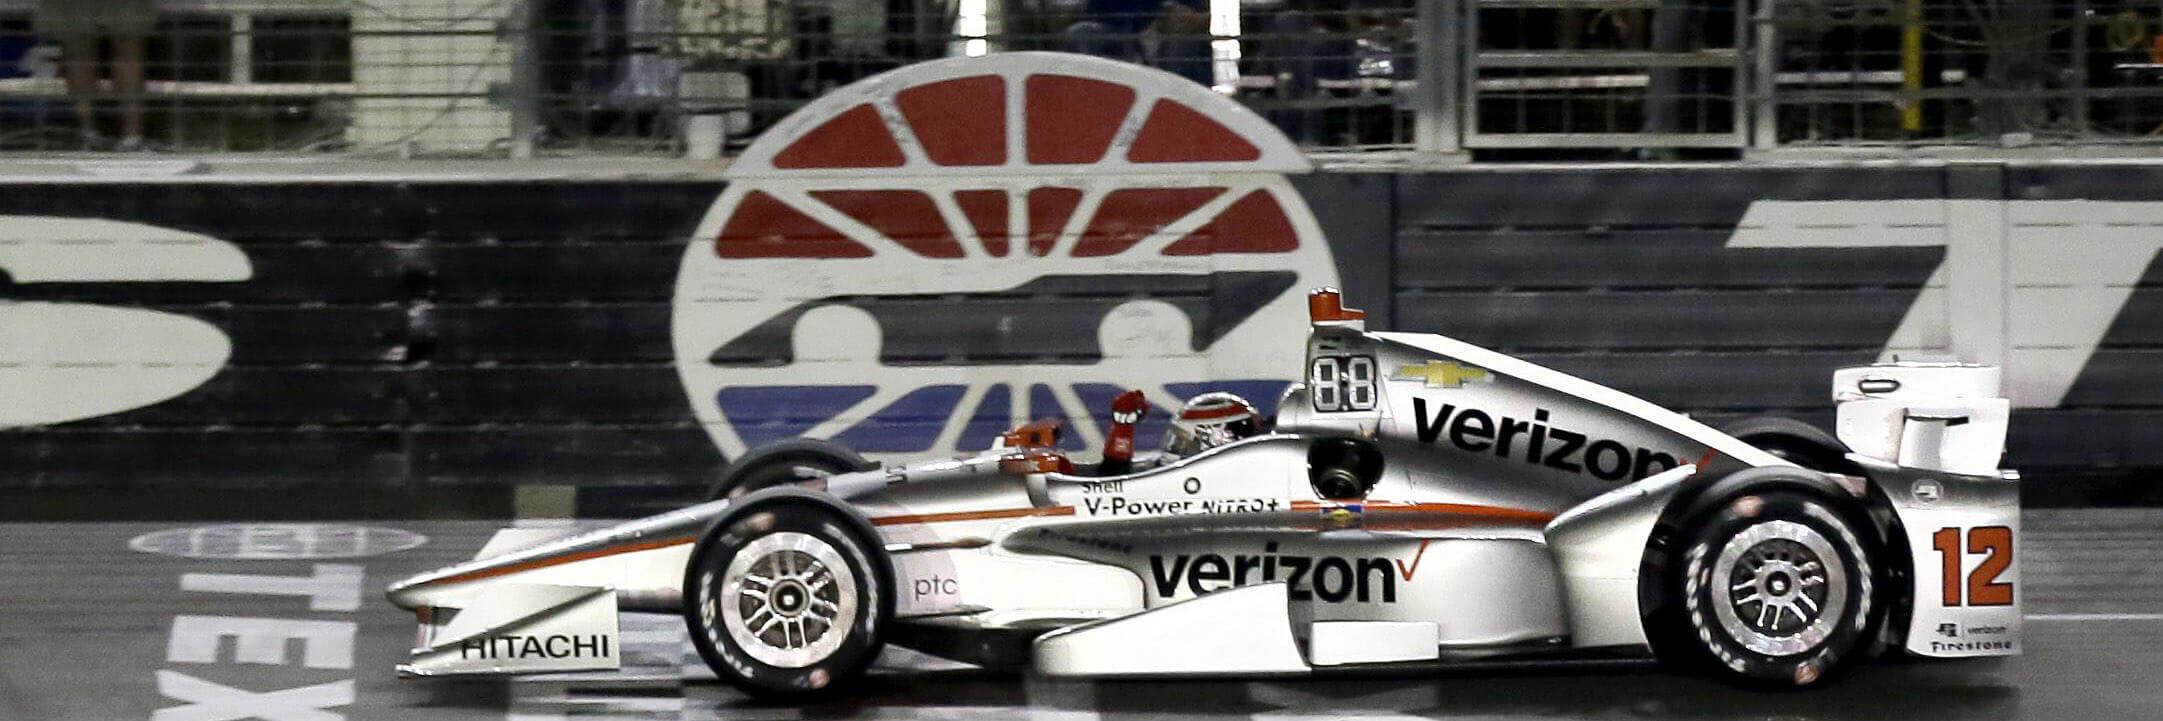 IndyCar - Genesys 300 Odds & Picks